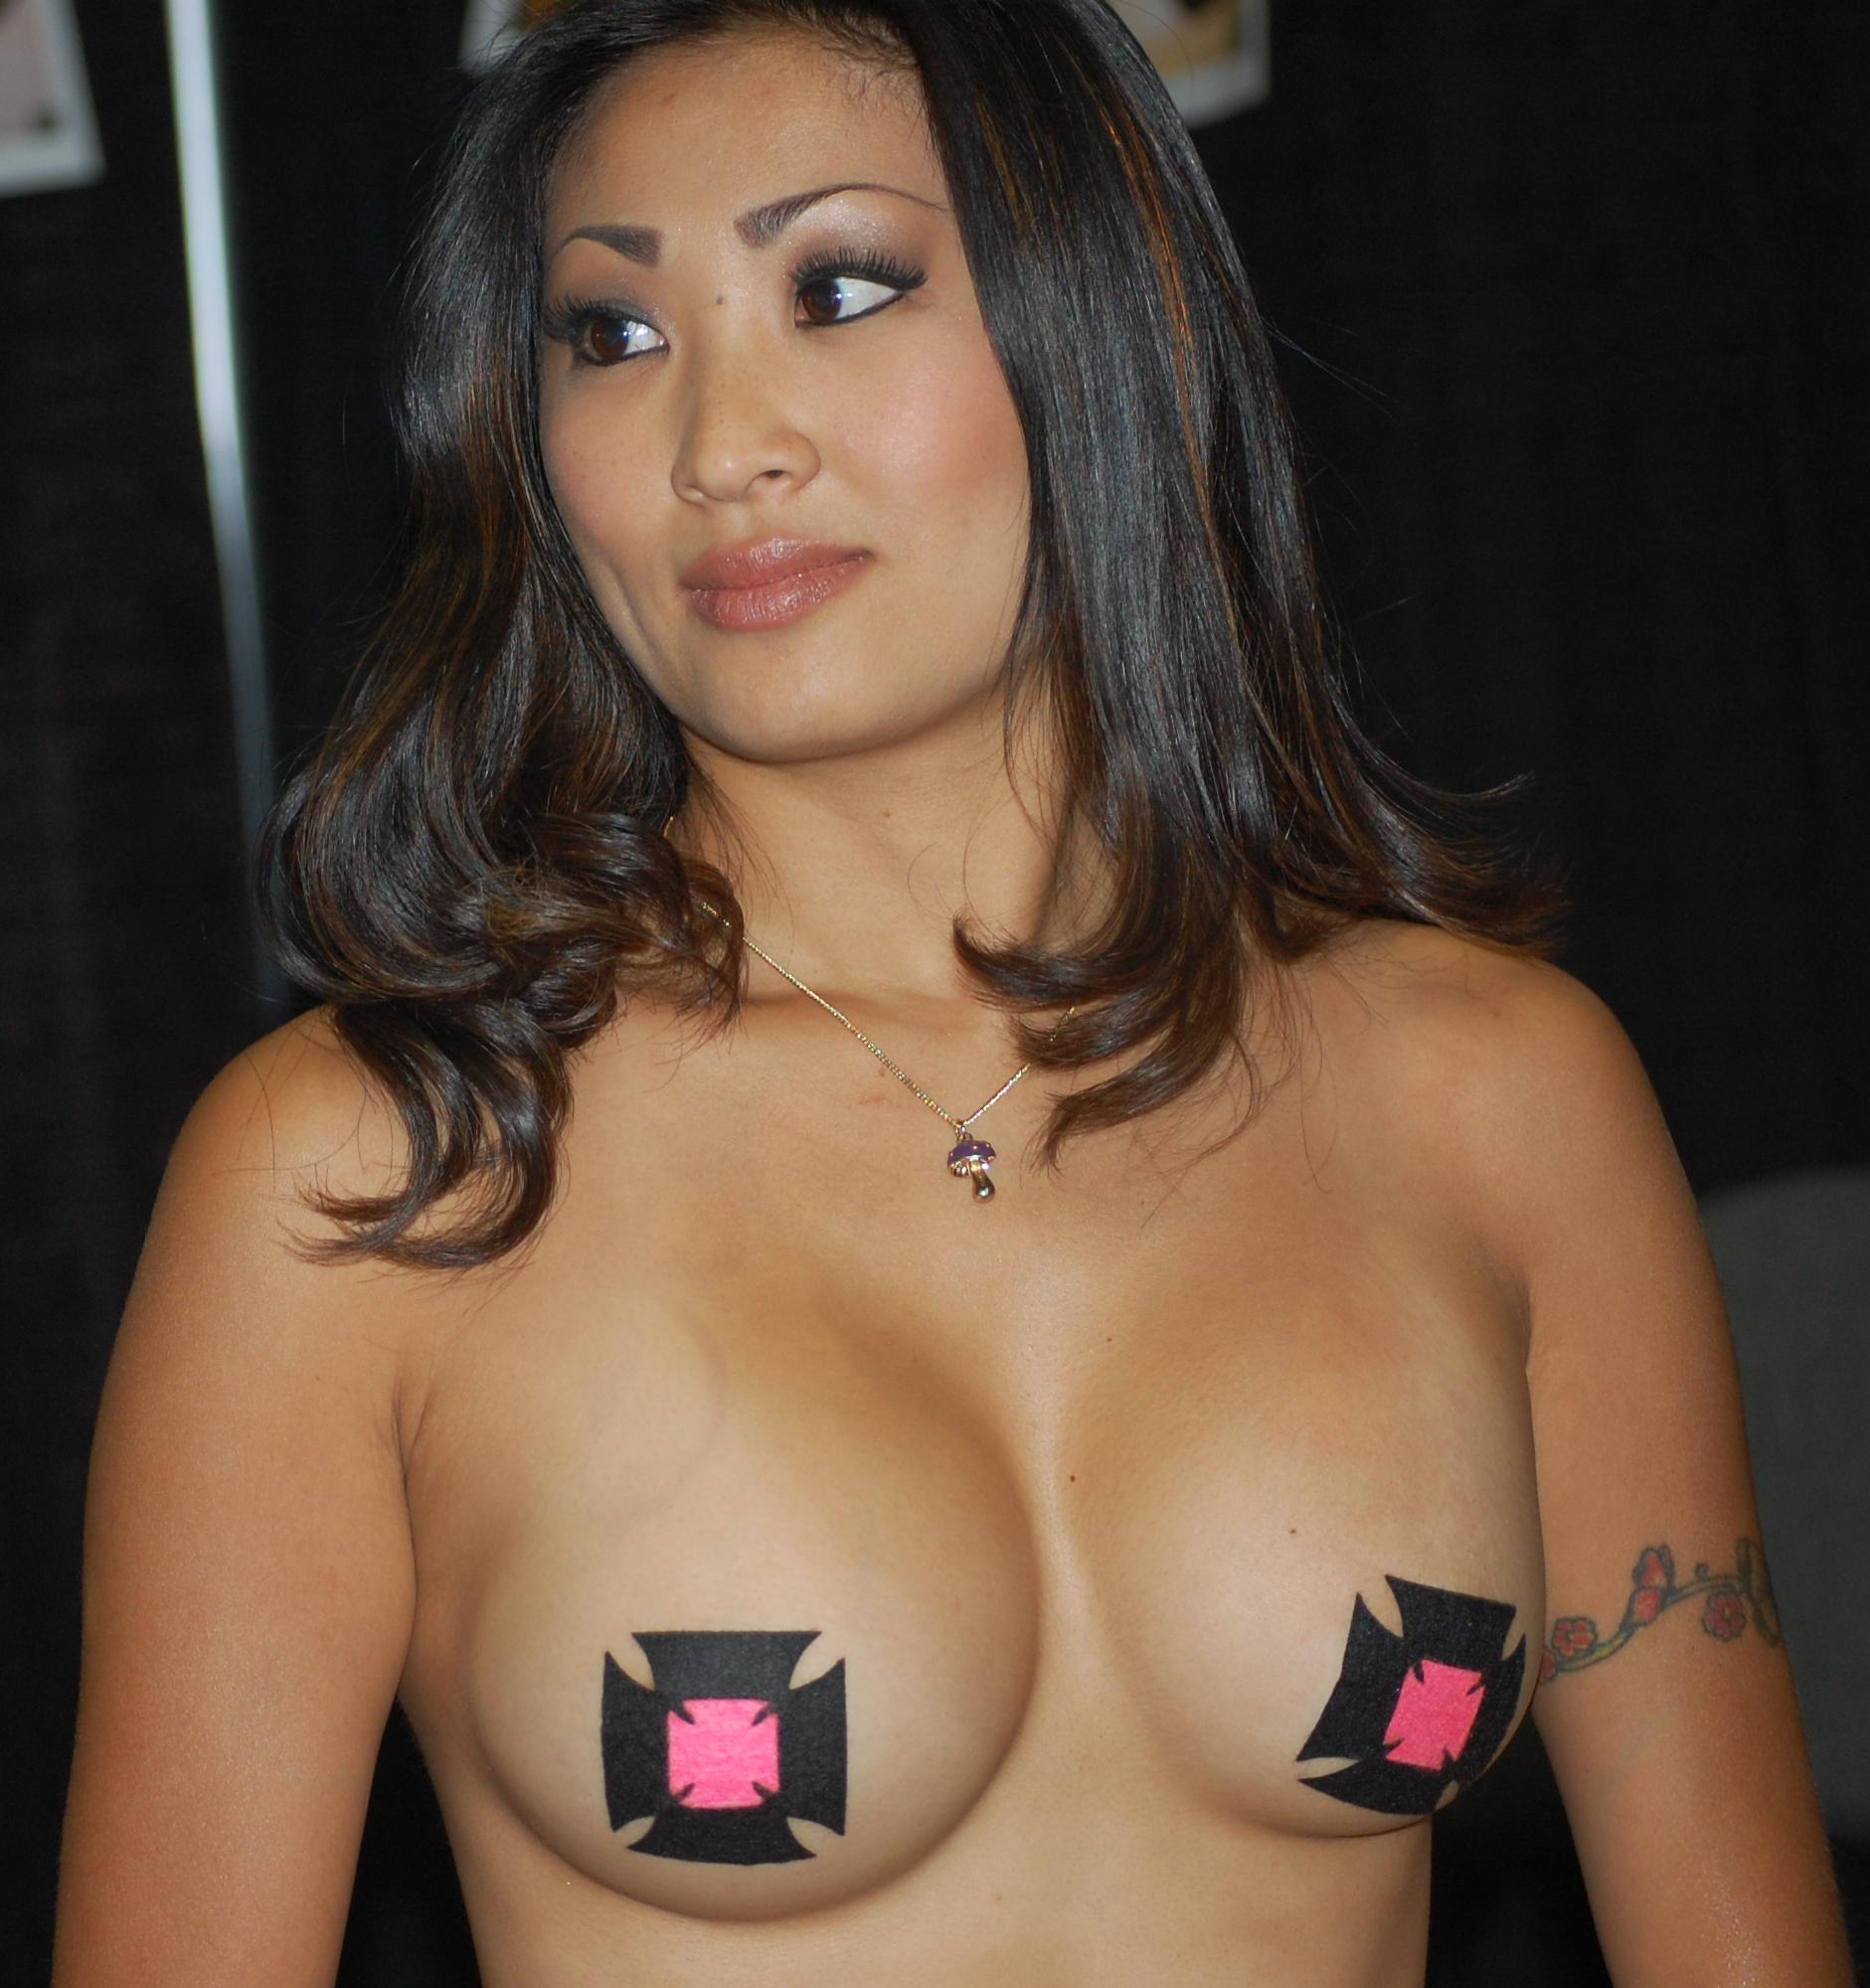 nude bigest cock of bangladeshi man photo